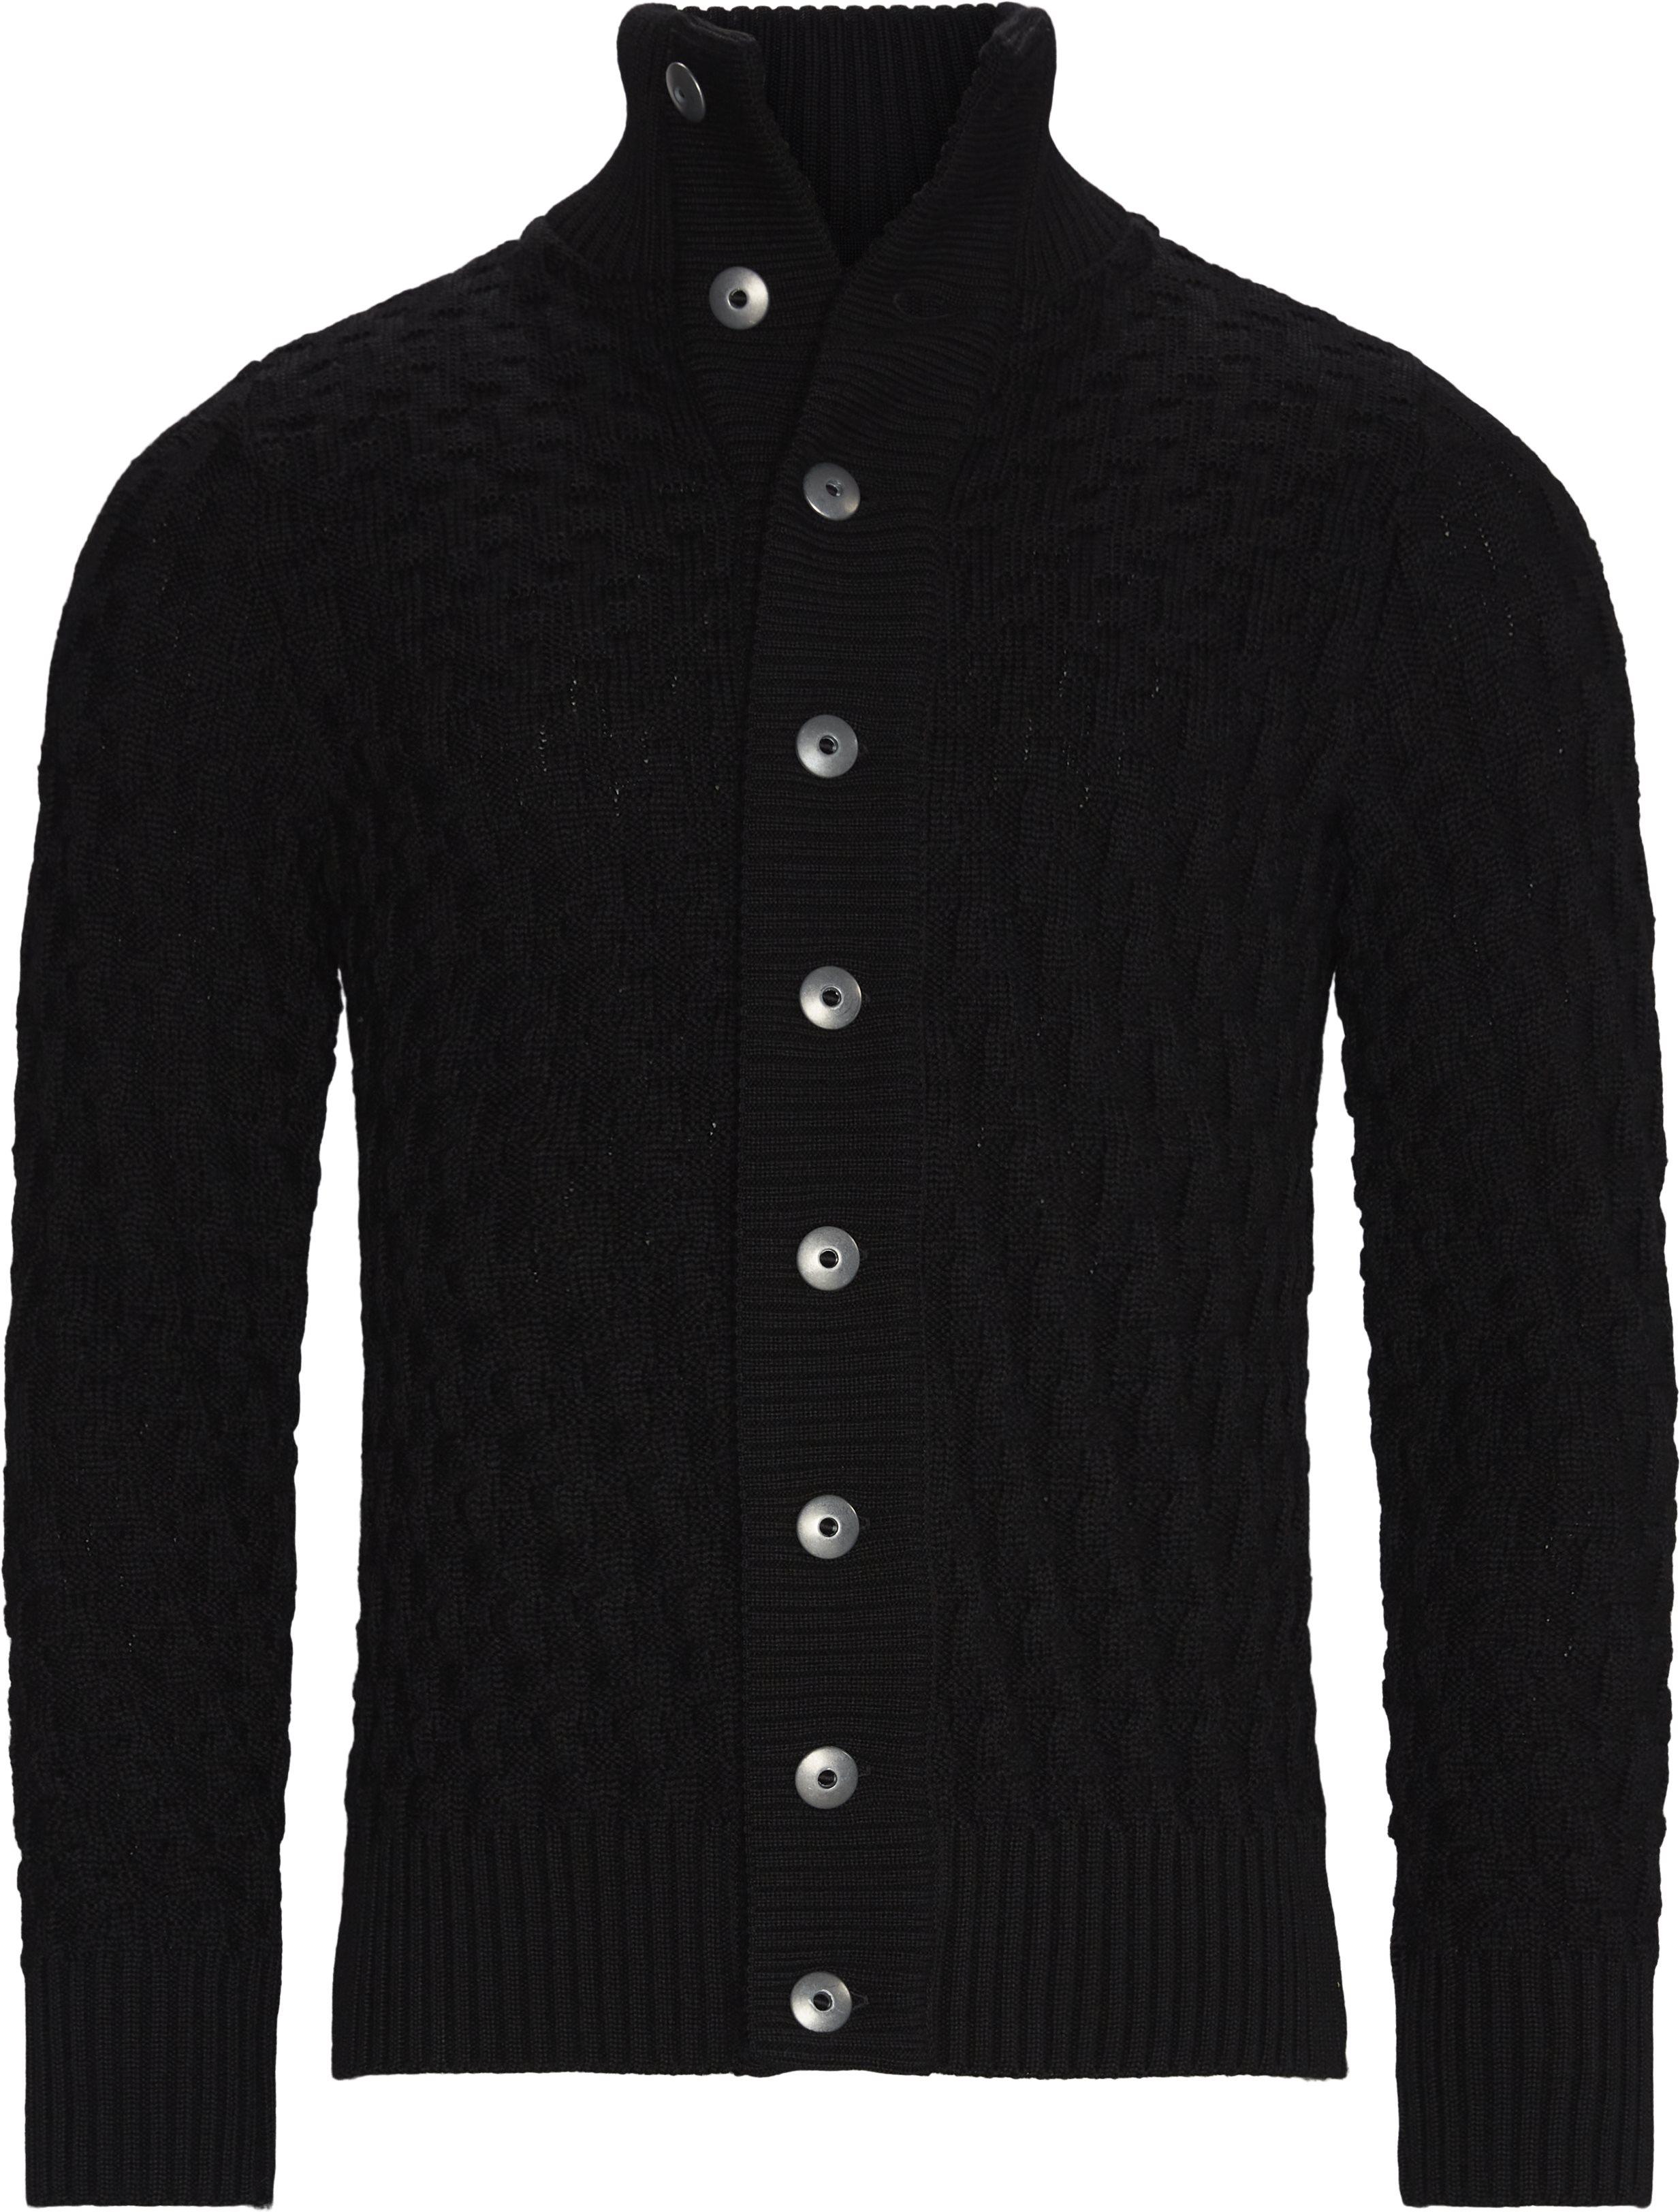 Knitwear - Regular fit - Black